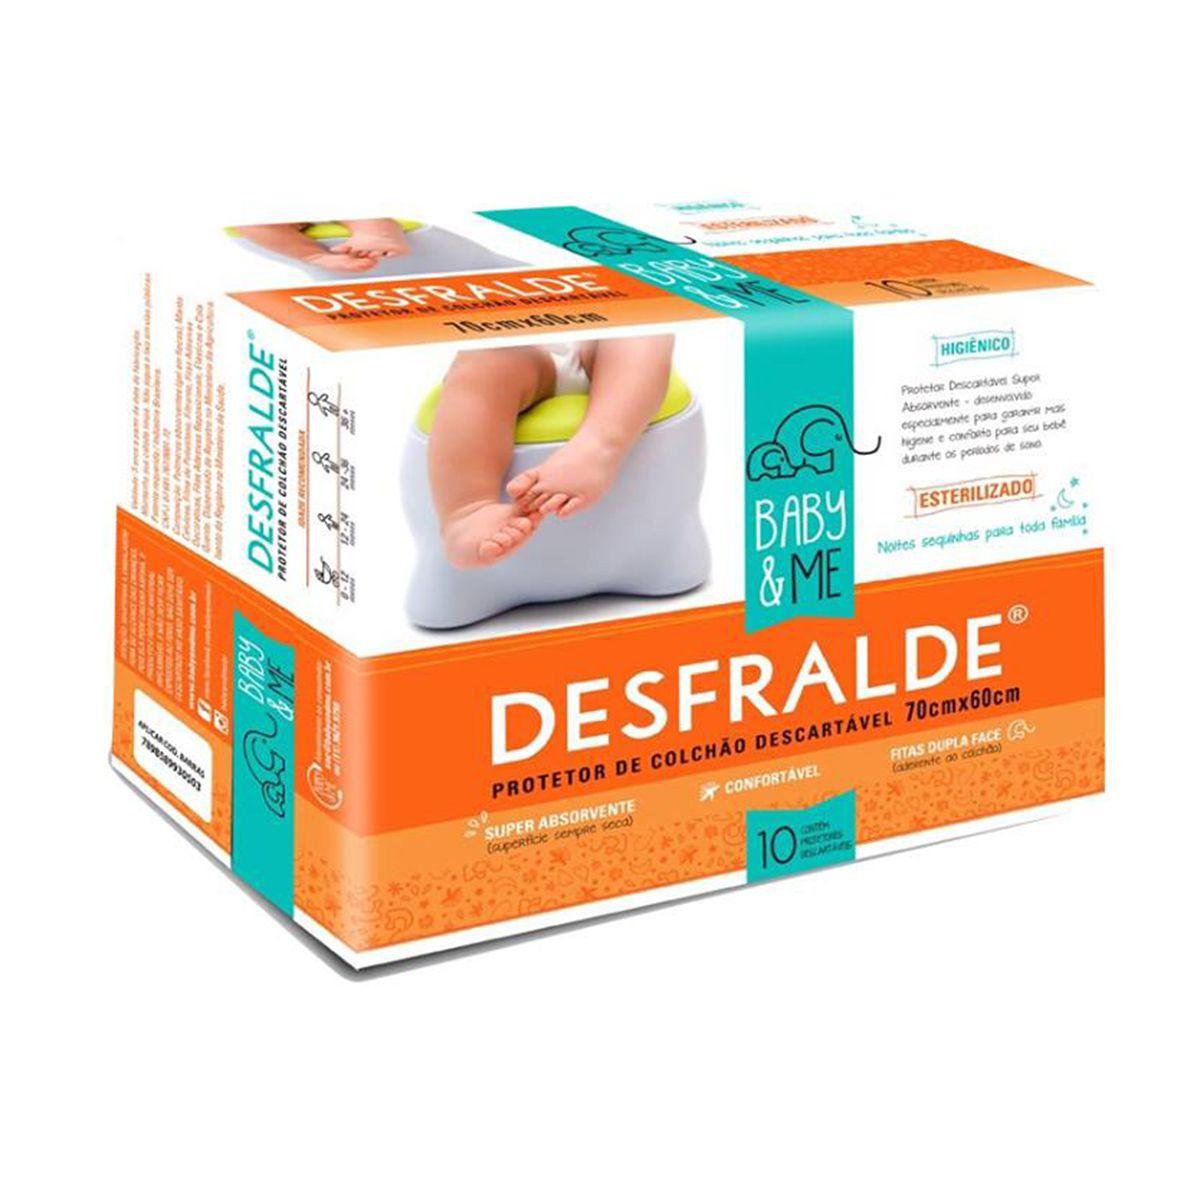 Desfralde Pacote c/10 un - Baby and Me